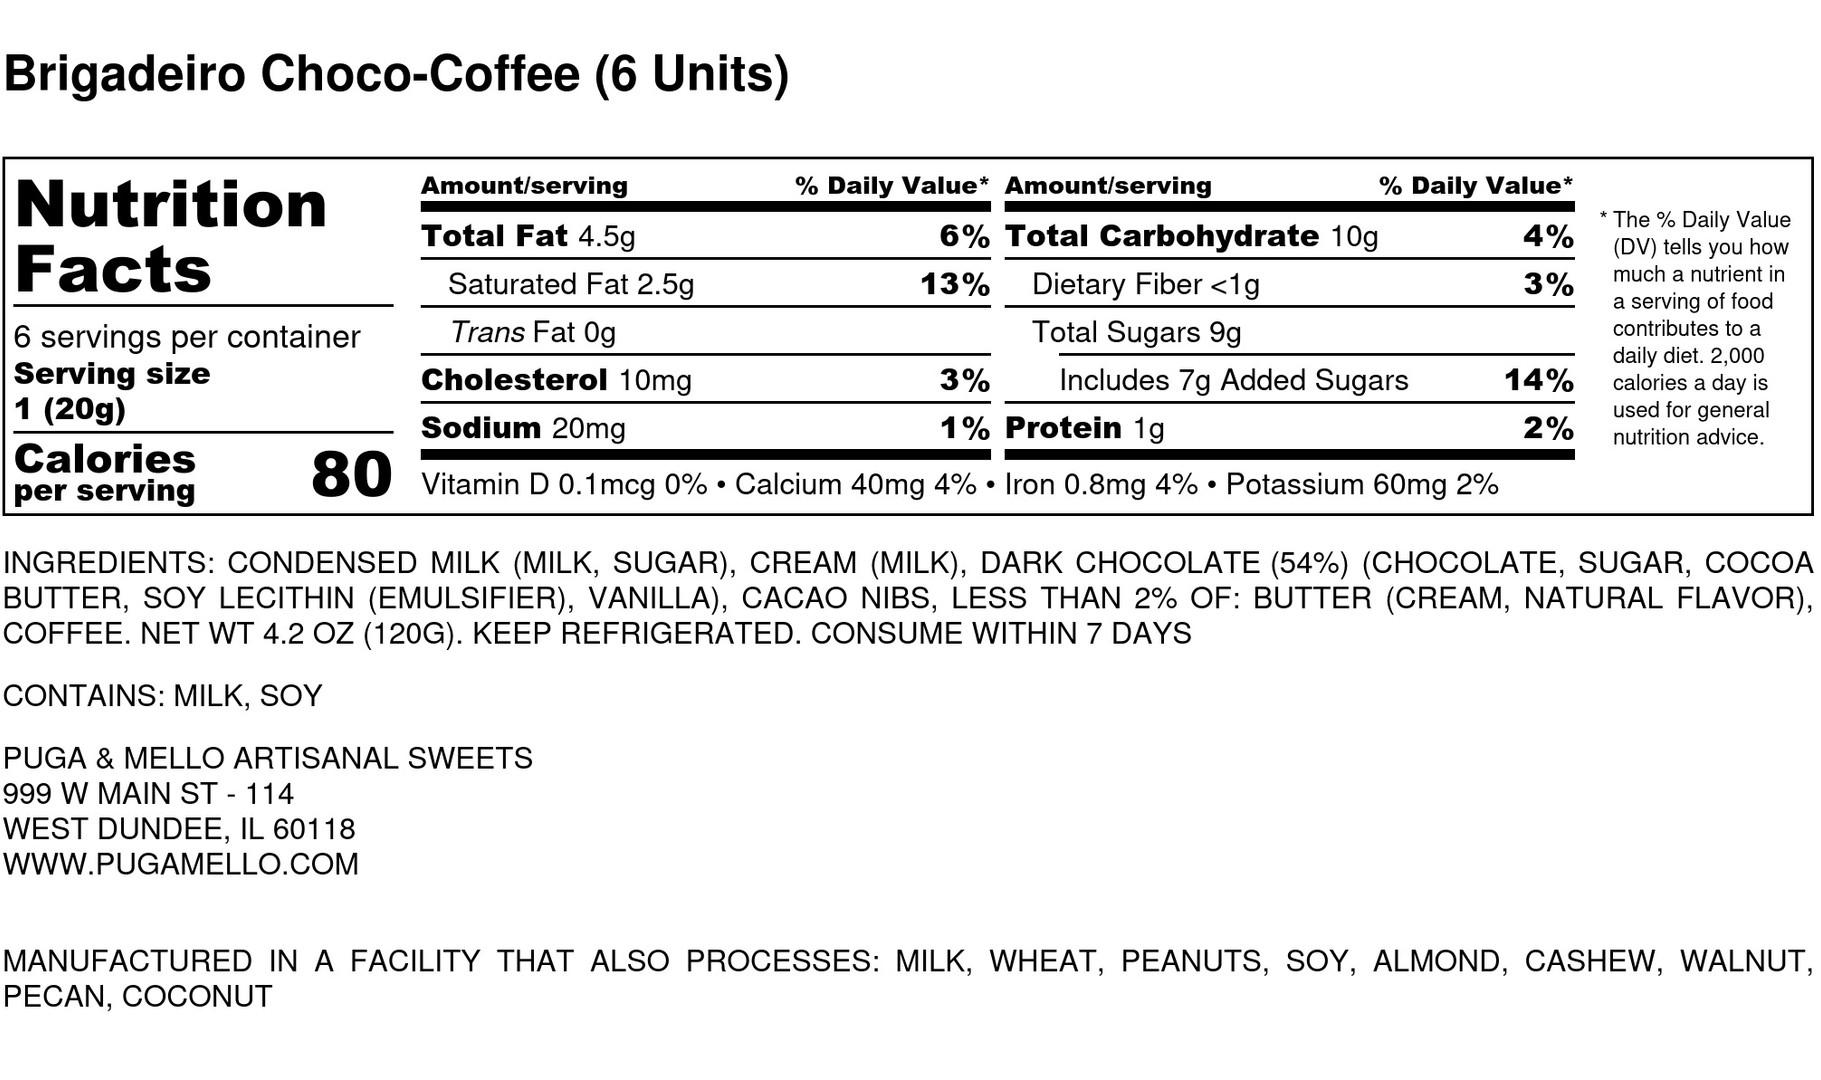 Brigadeiro Choco-Coffee (6 Units) - Nutr